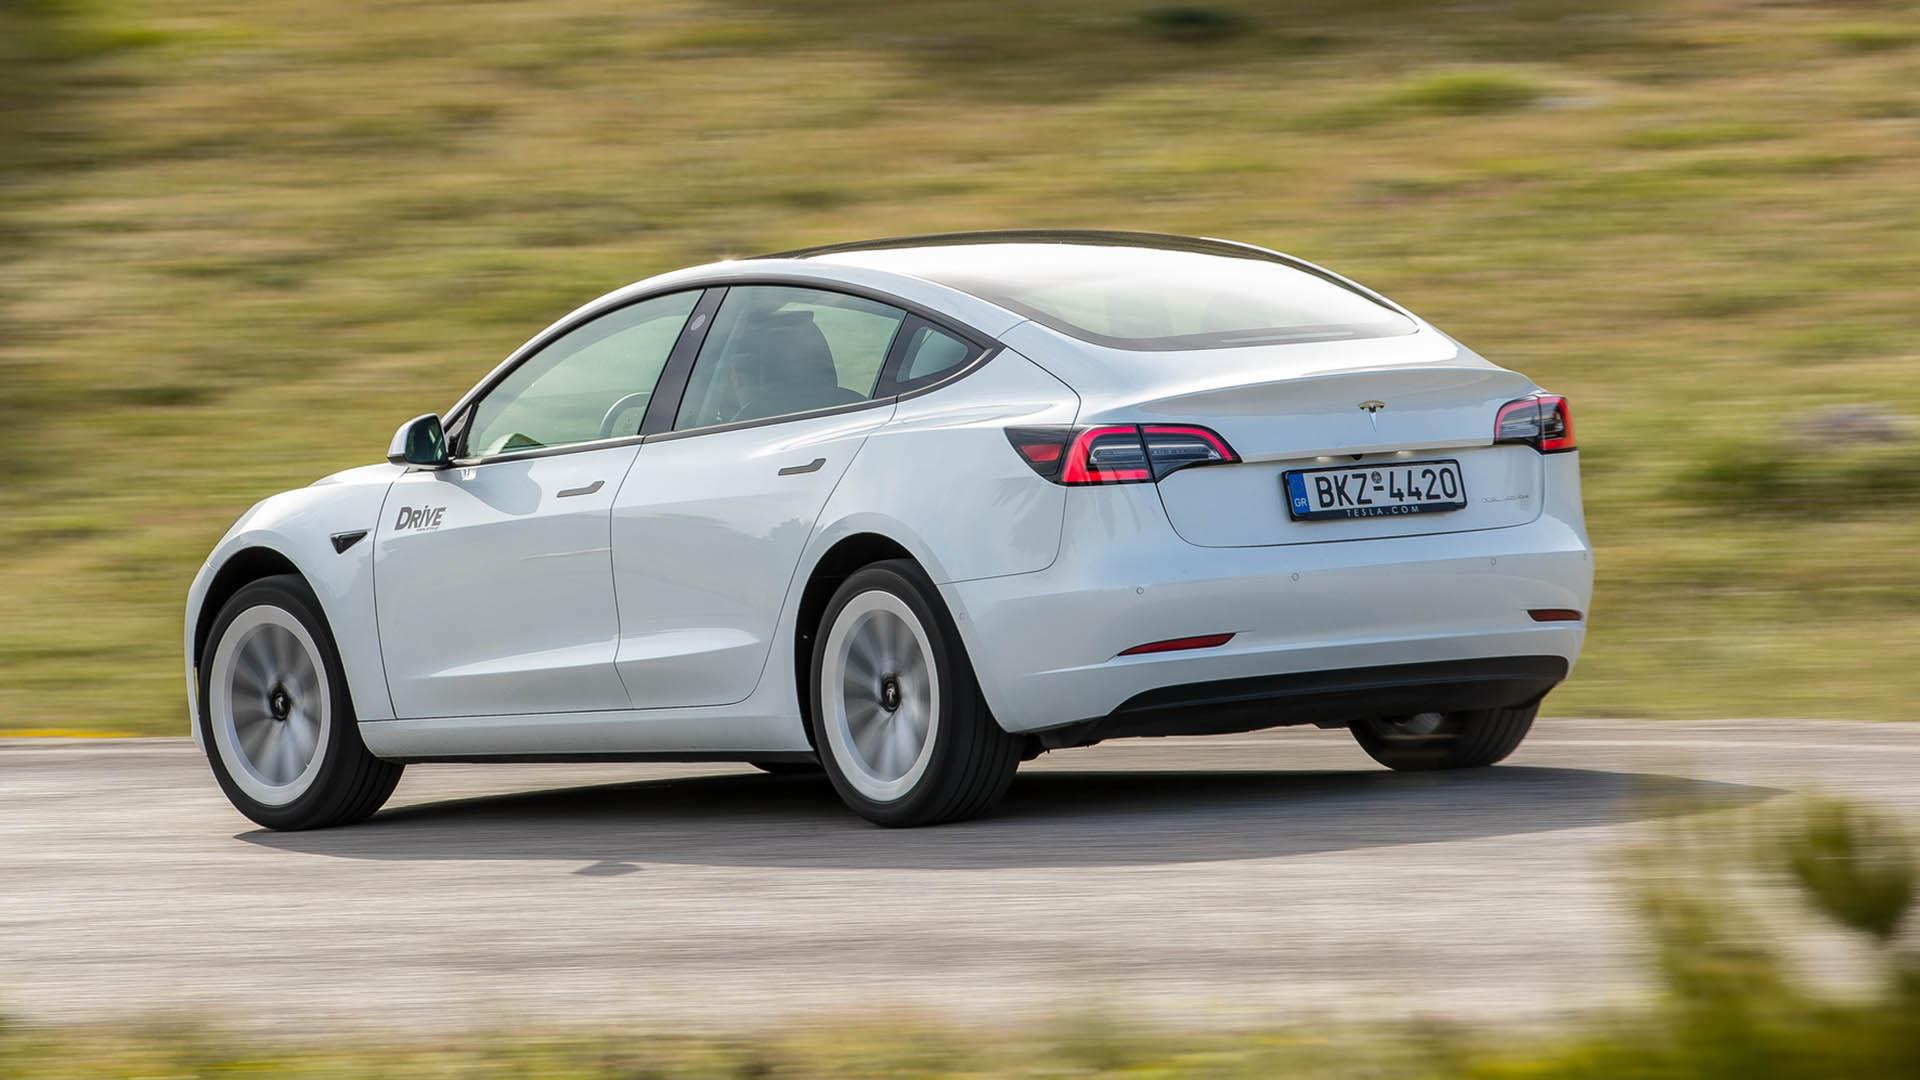 Tesla Model 3: Δοκιμάζουμε το πιο πολυσυζητημένο αυτοκίνητο της δεκαετίας! (video)